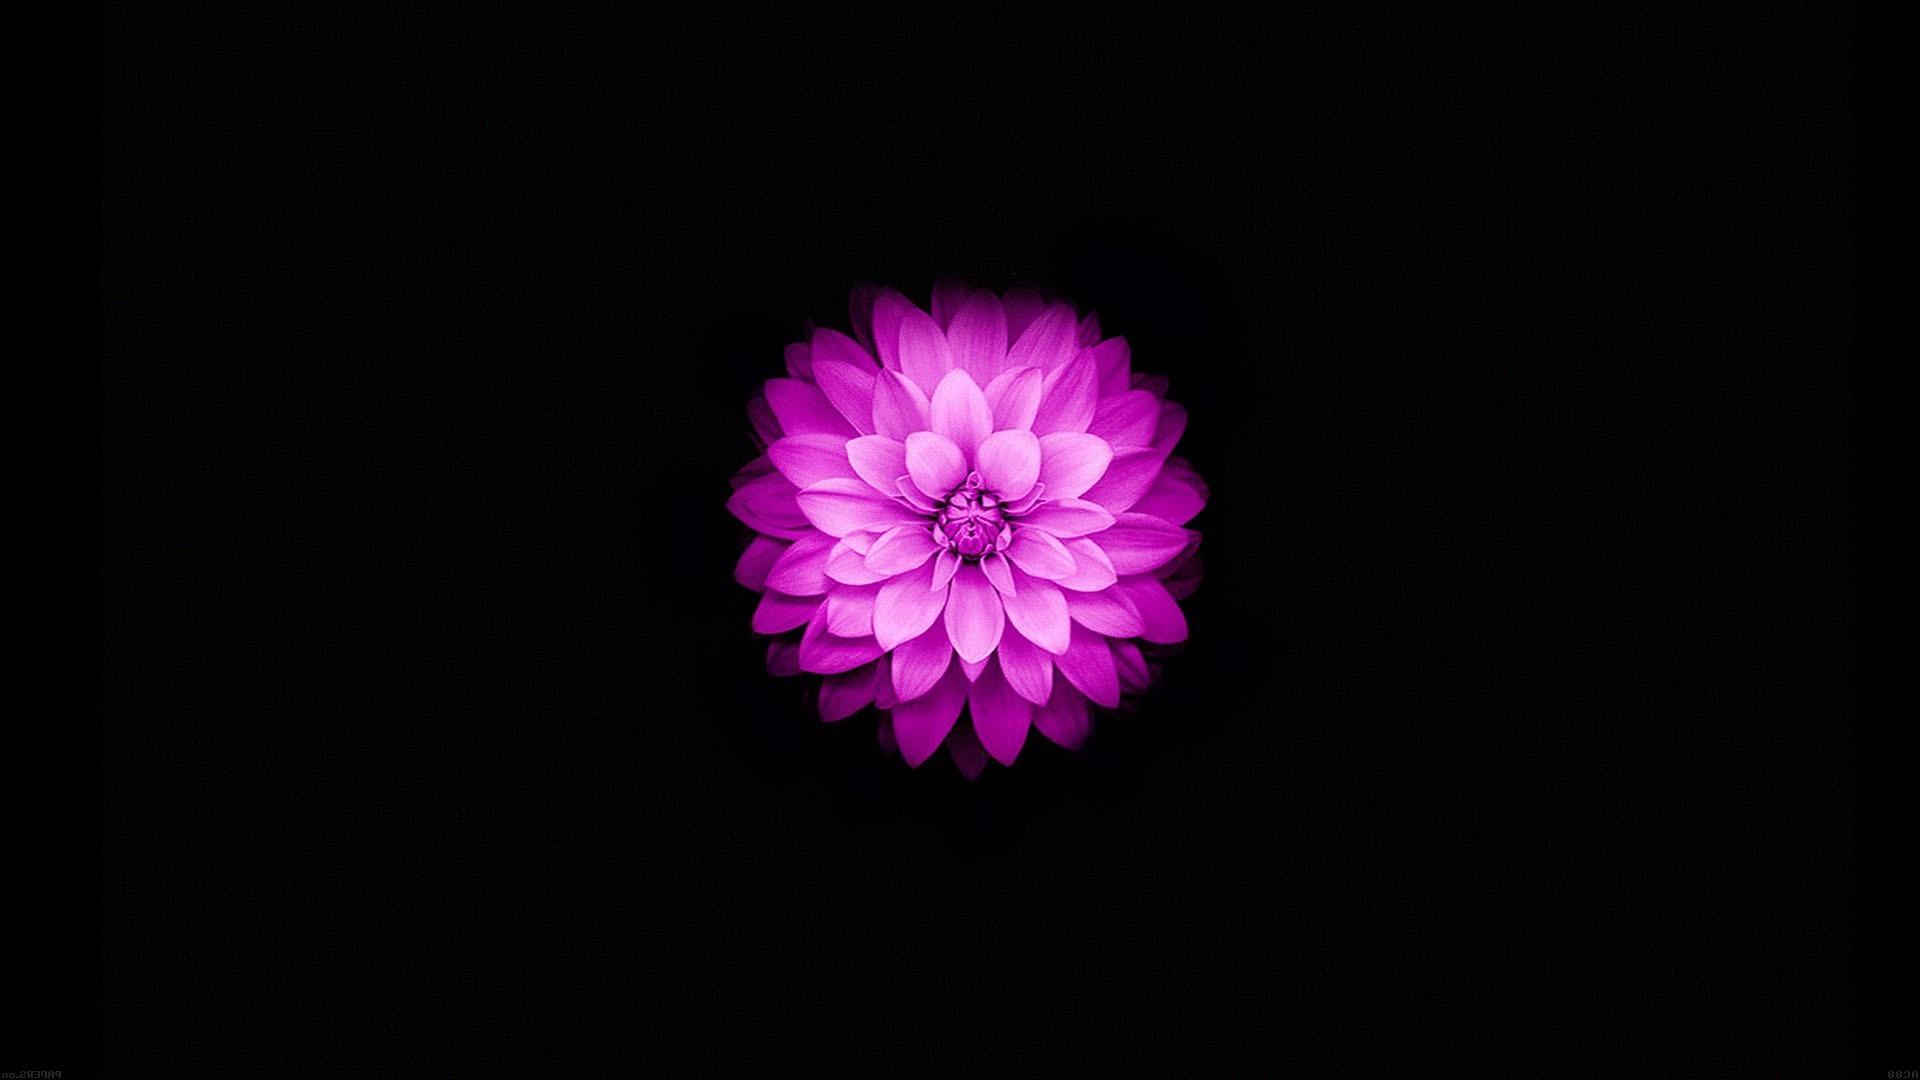 Flowers on Black Background Wallpaper (77+ images)